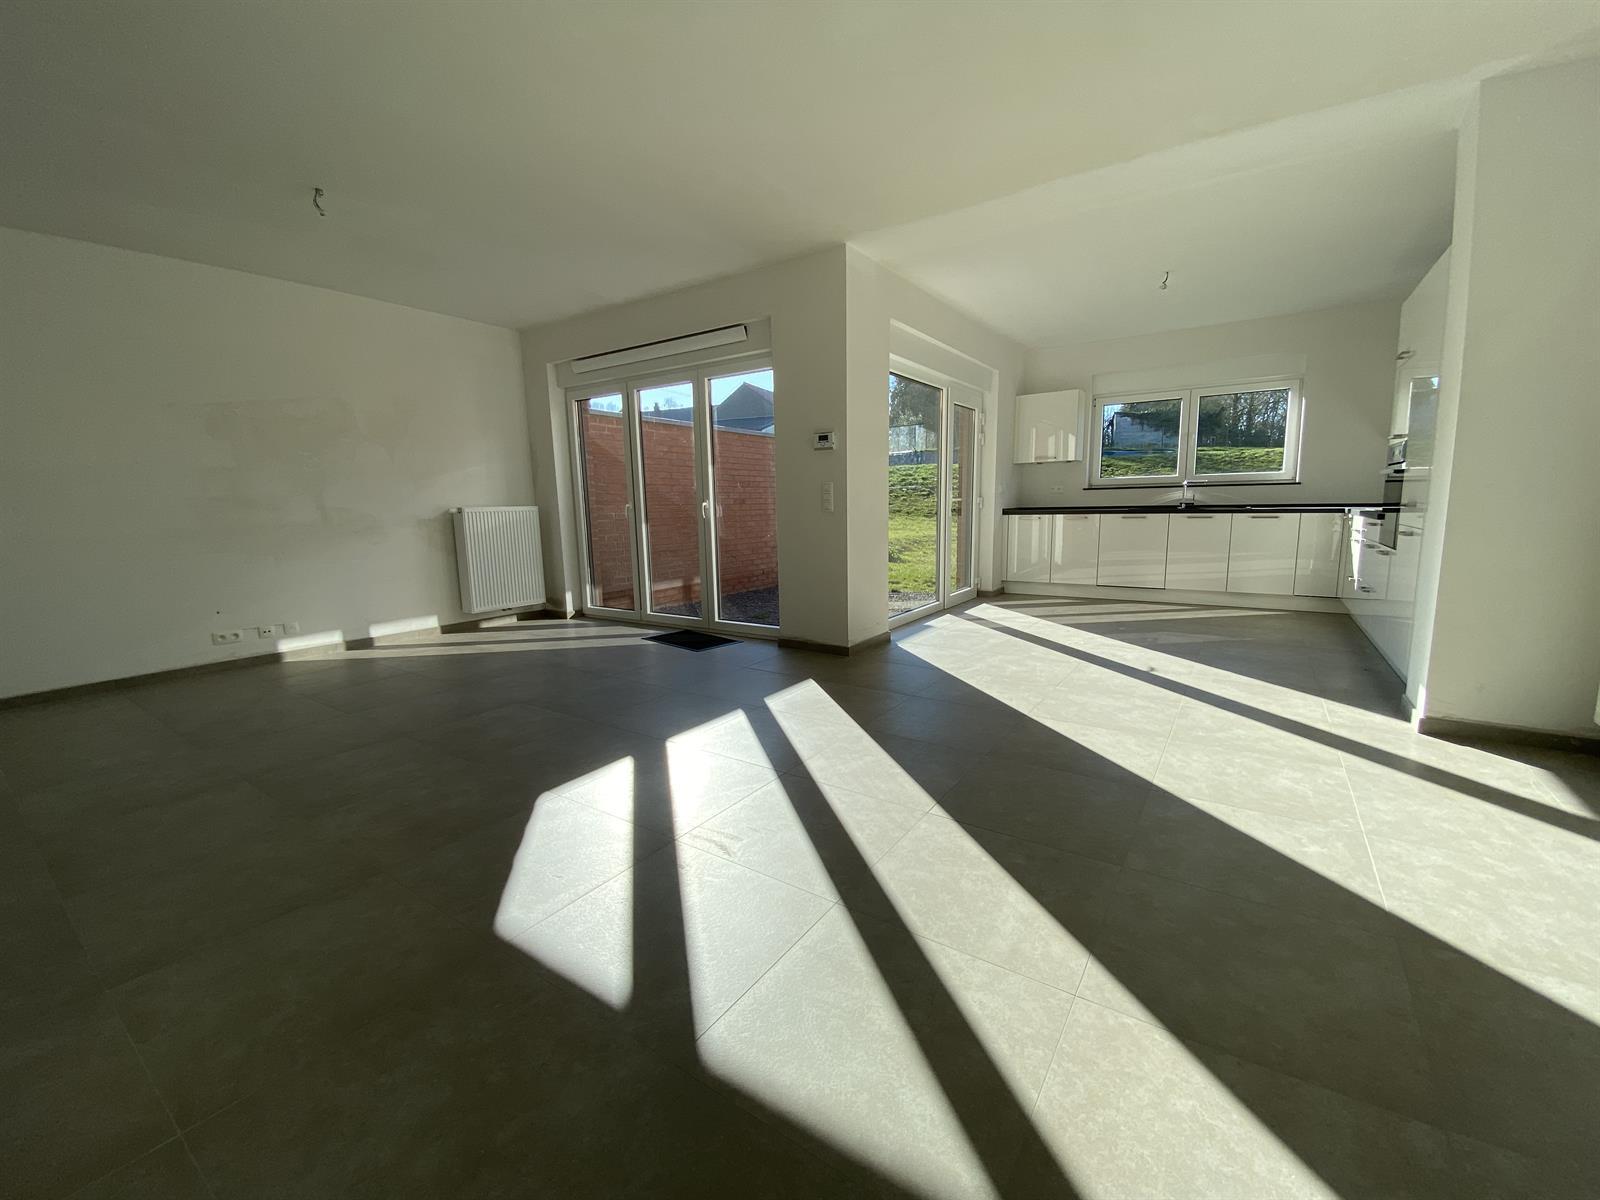 Maison - Berloz - #4002947-25